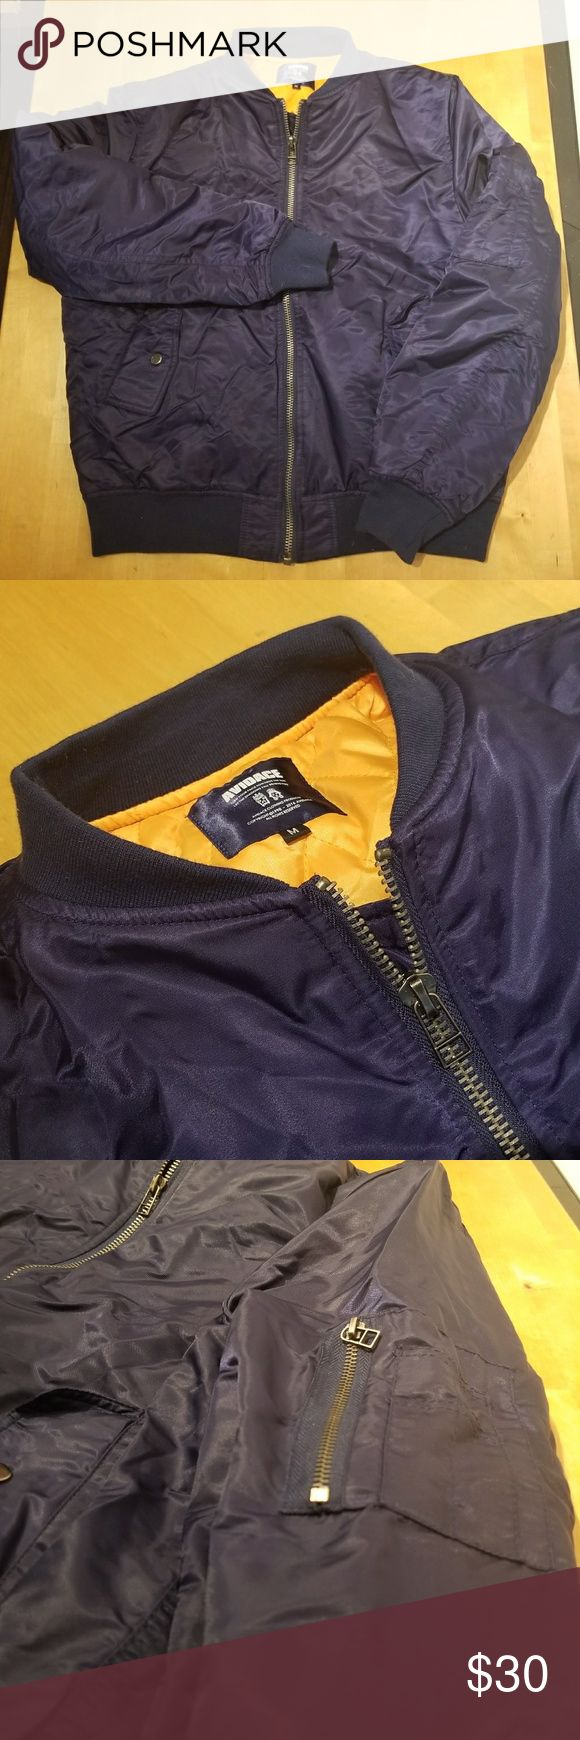 Men's nylon bomber Men's Avidace nylon bomber jacket. Dark blue with orange lining. Two snap closed hand pockets and zip pocket on arm. Like new condition, no flaws.  Men's M Chest measured 21 in flat Length shoulder to hem 25.5 in Jackets & Coats Bomber & Varsity